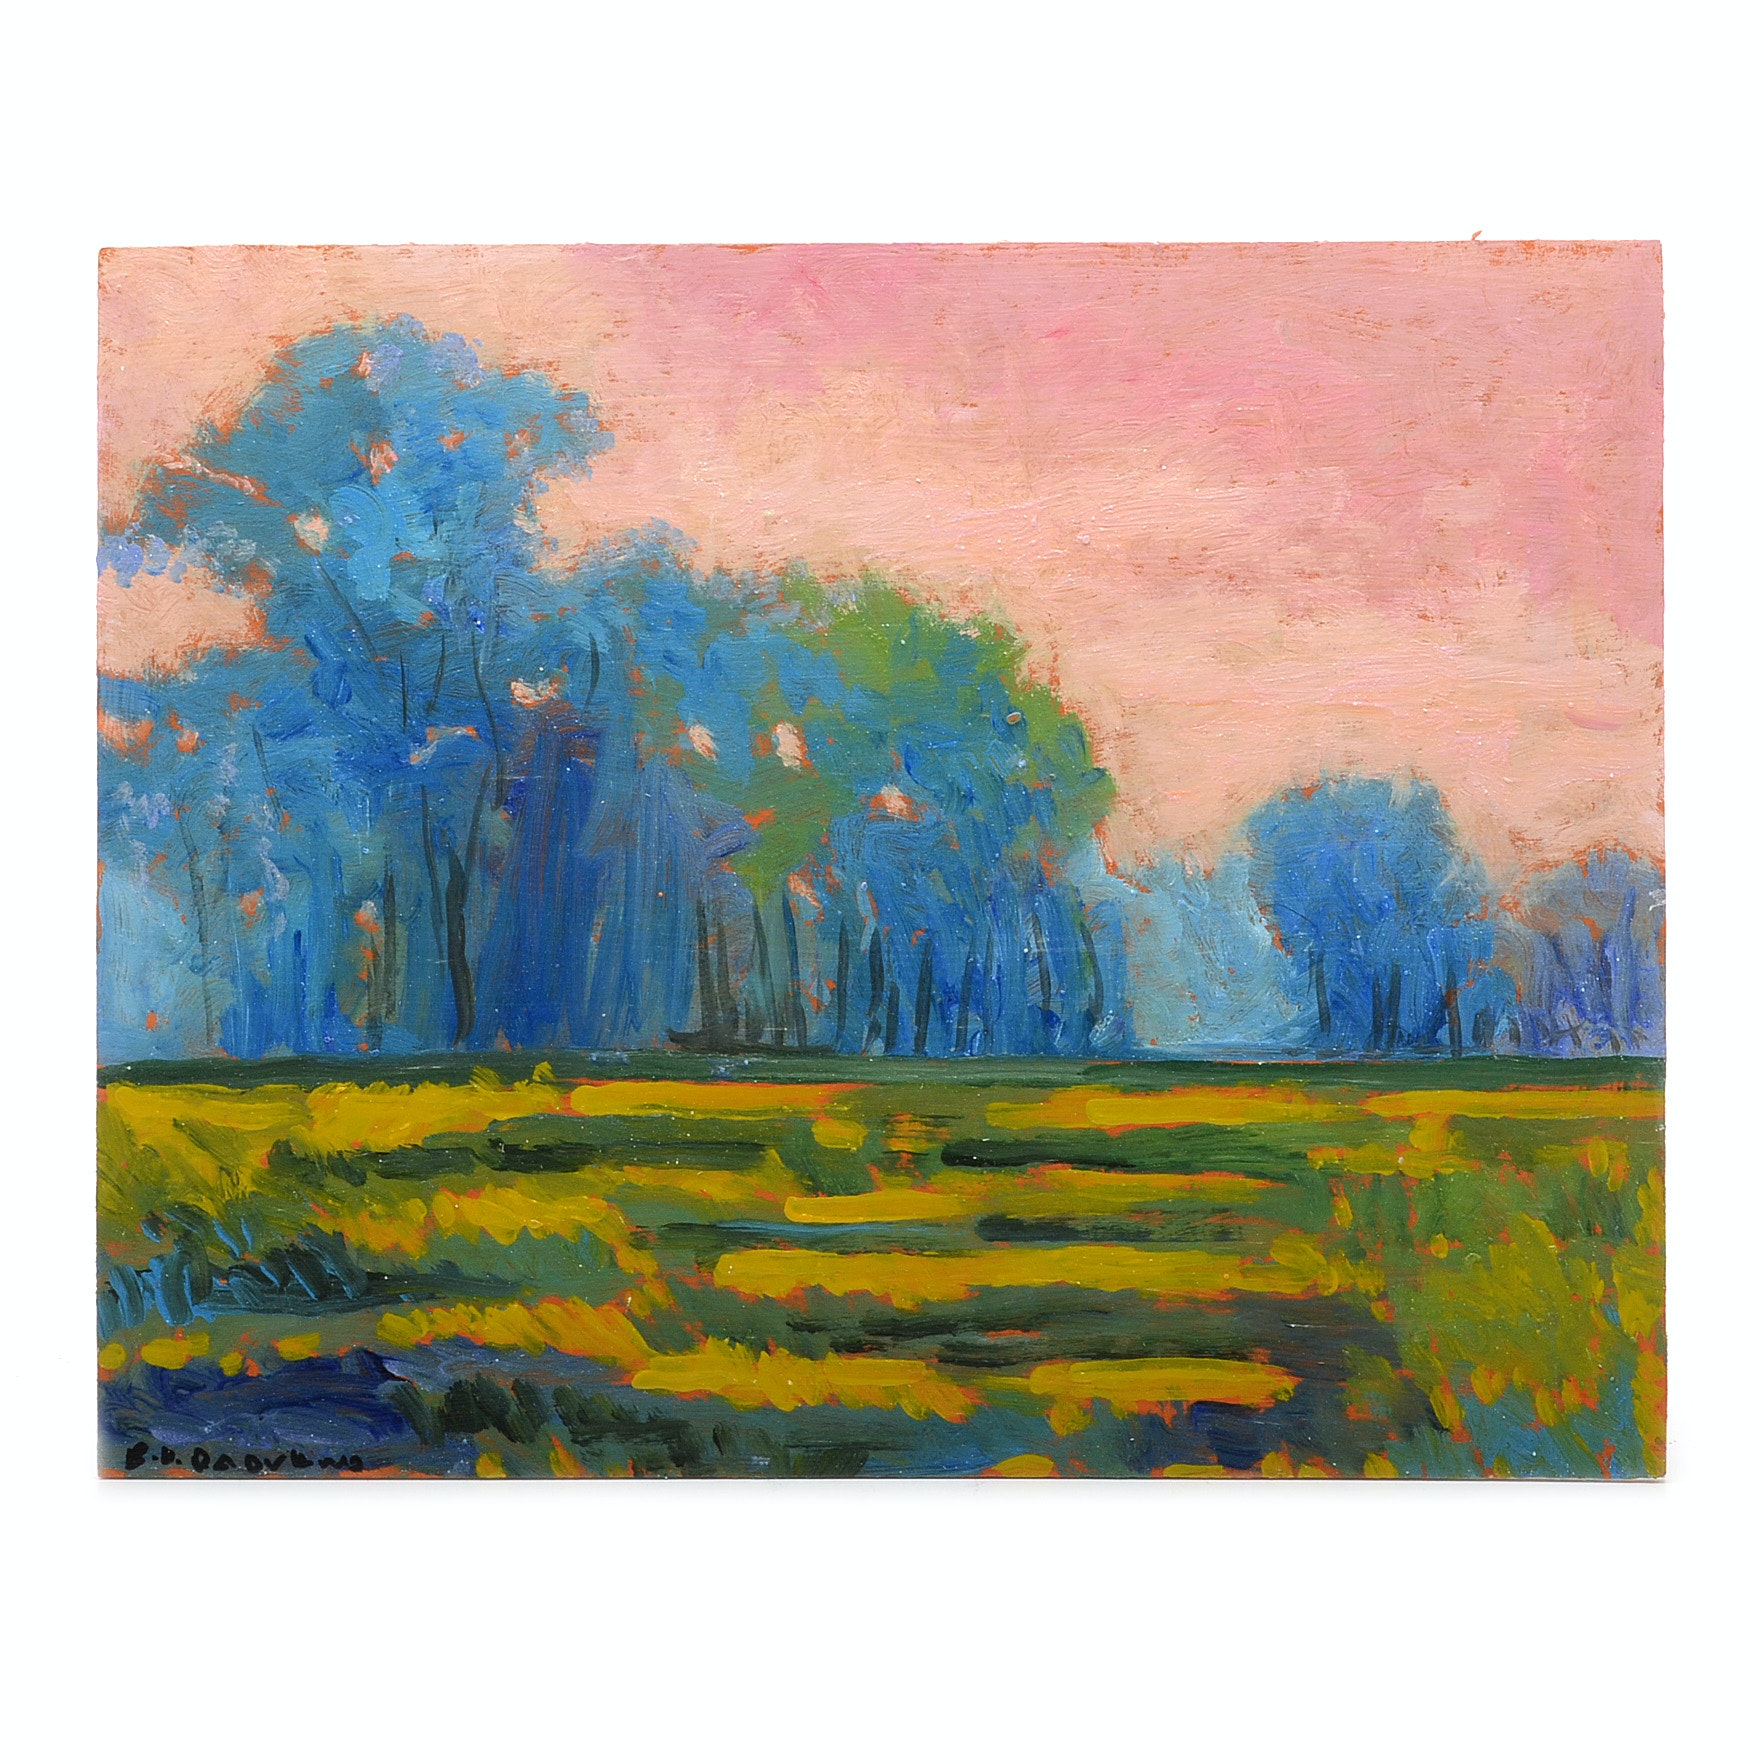 Sulmaz H. Radvand Original Acrylic Painting of a Landscape